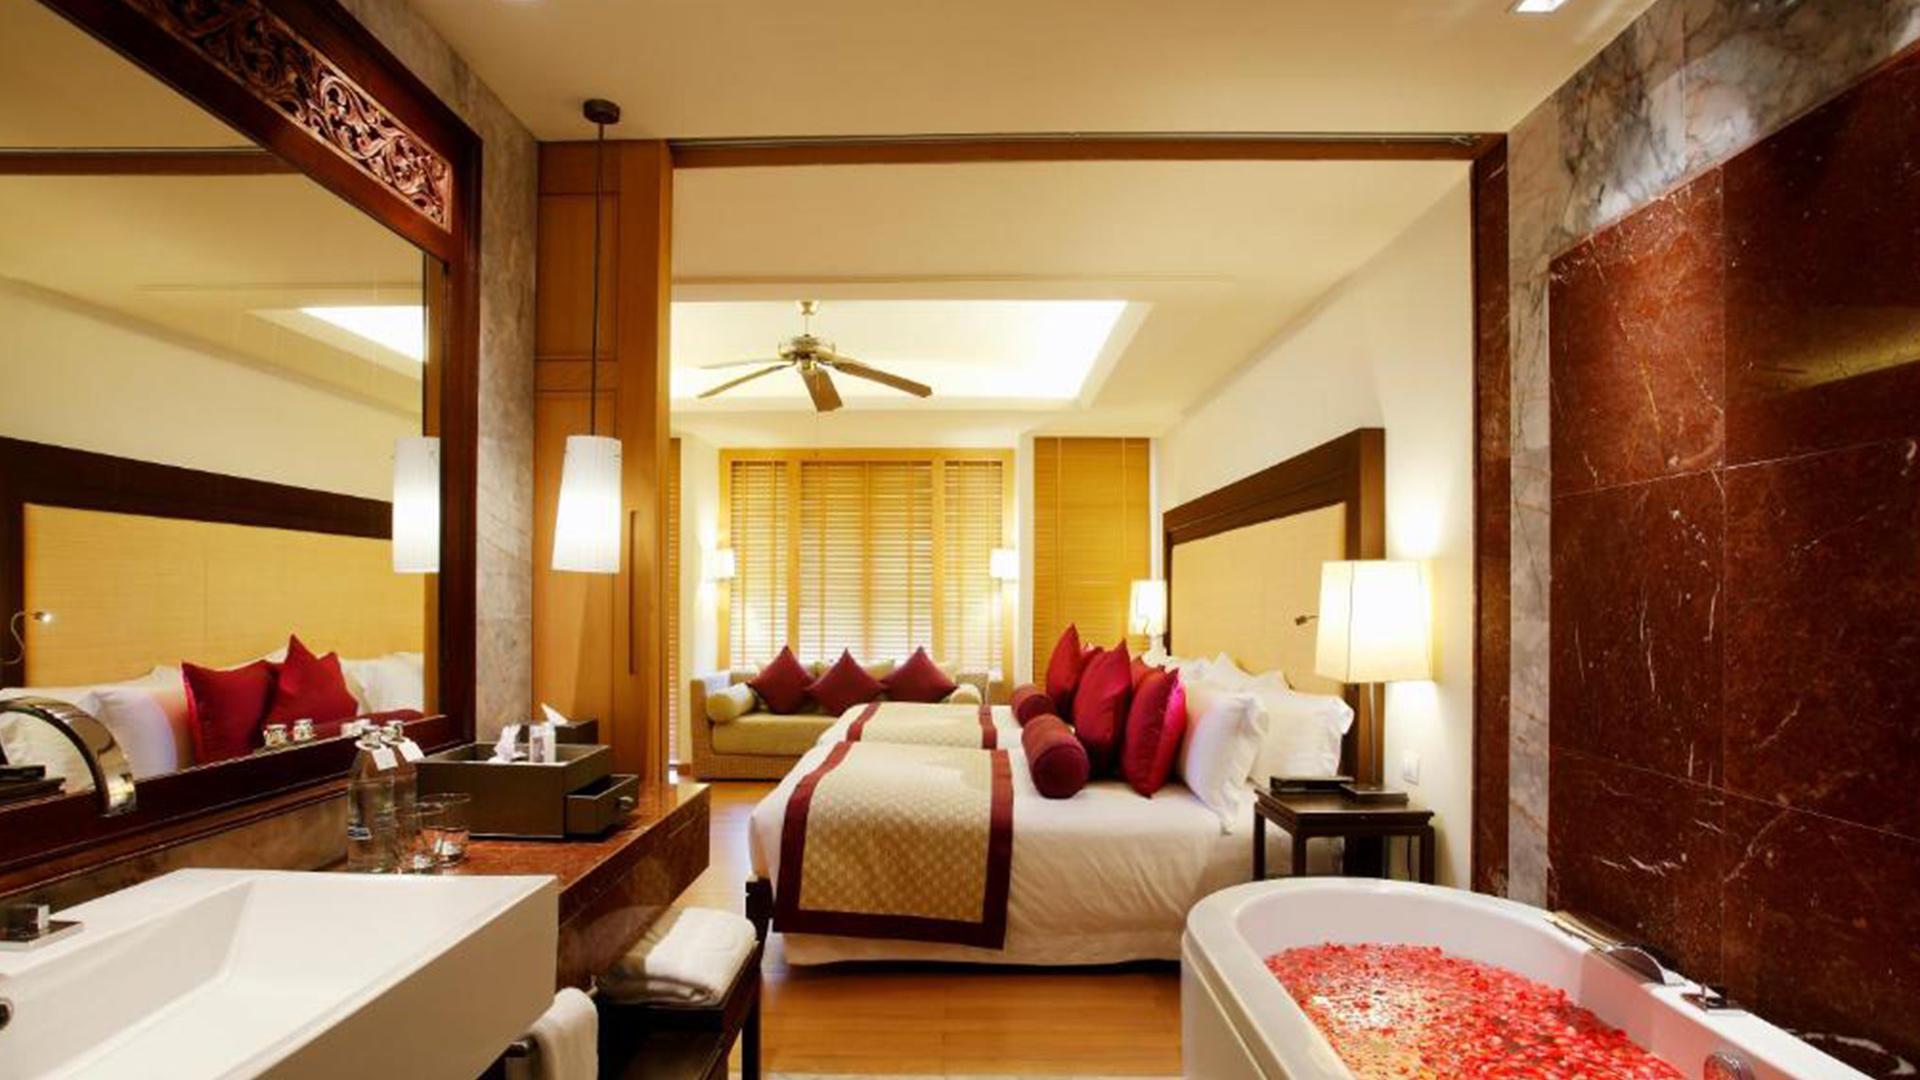 Deluxe Room image 1 at Centara Grand Beach Resort Phuket by อำเภอเมืองภูเก็ต, Phuket, Thailand